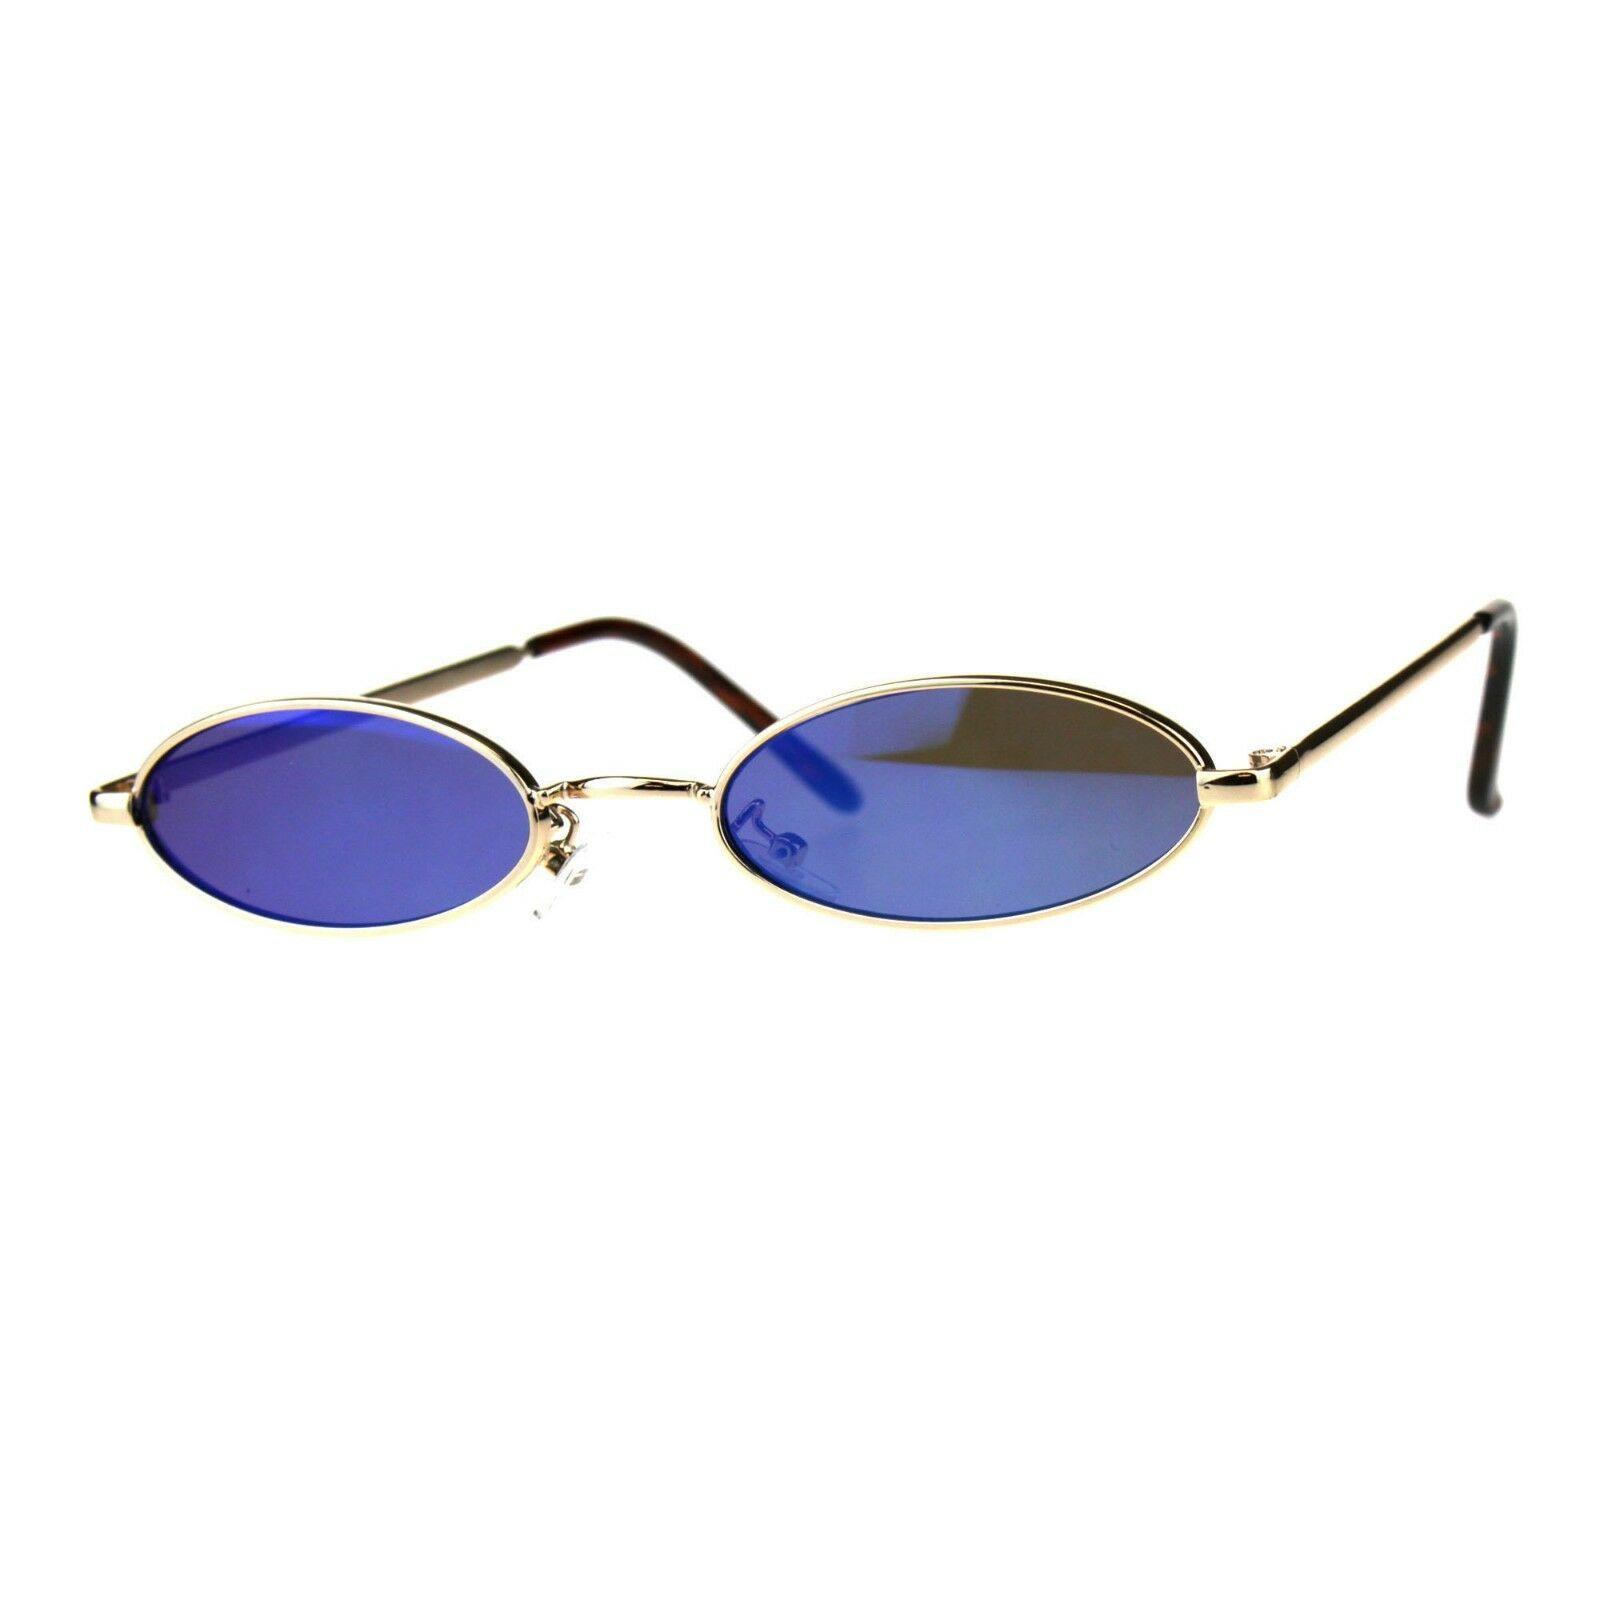 Super Skinny Sunglasses Womens Oval Flat Metal Frame Mirror Lens UV400